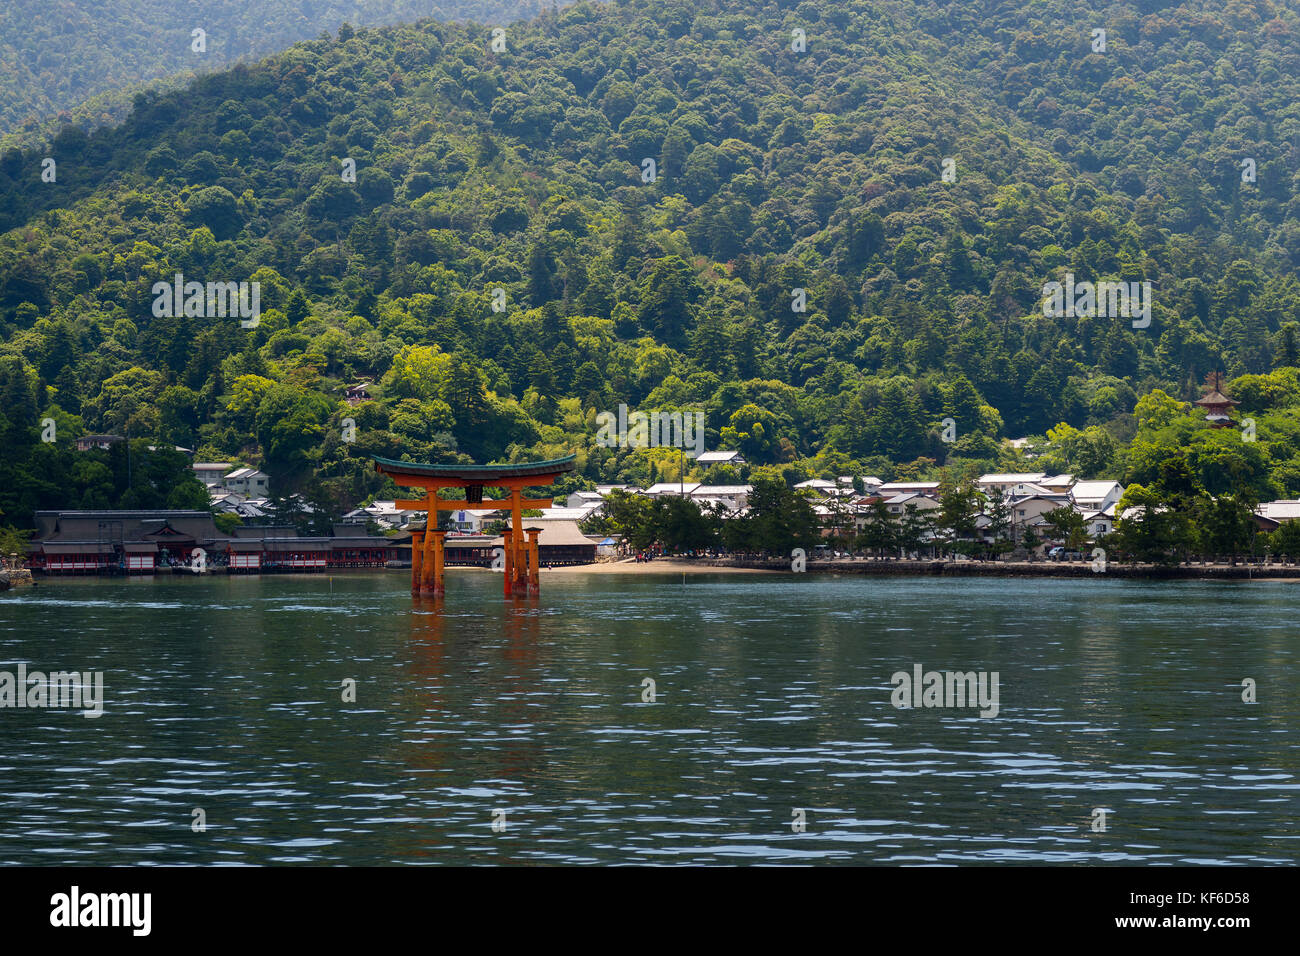 Miyajima - Japan, May 26, 2017: Red Torii gate of the Itsukushima Shrine in the sea near Miyajima - Stock Image